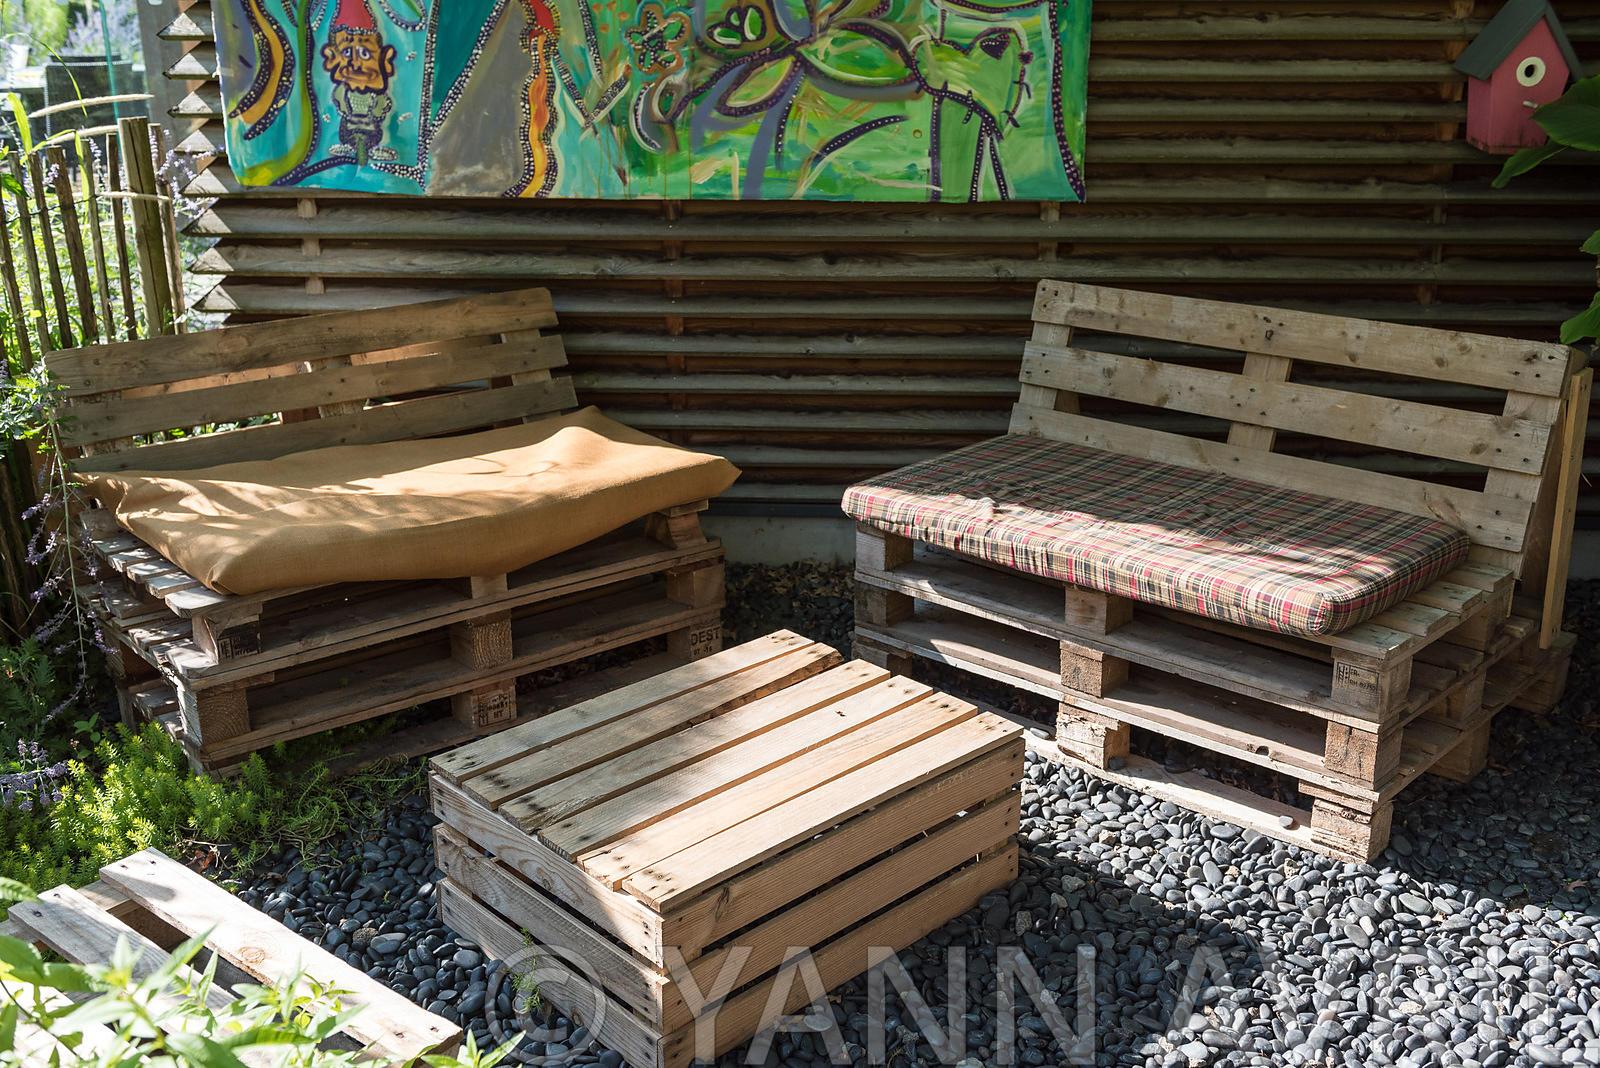 Yann Avril Photography   Garden And Nature Salon De Jardin ... concernant Salon De Jardin Bois